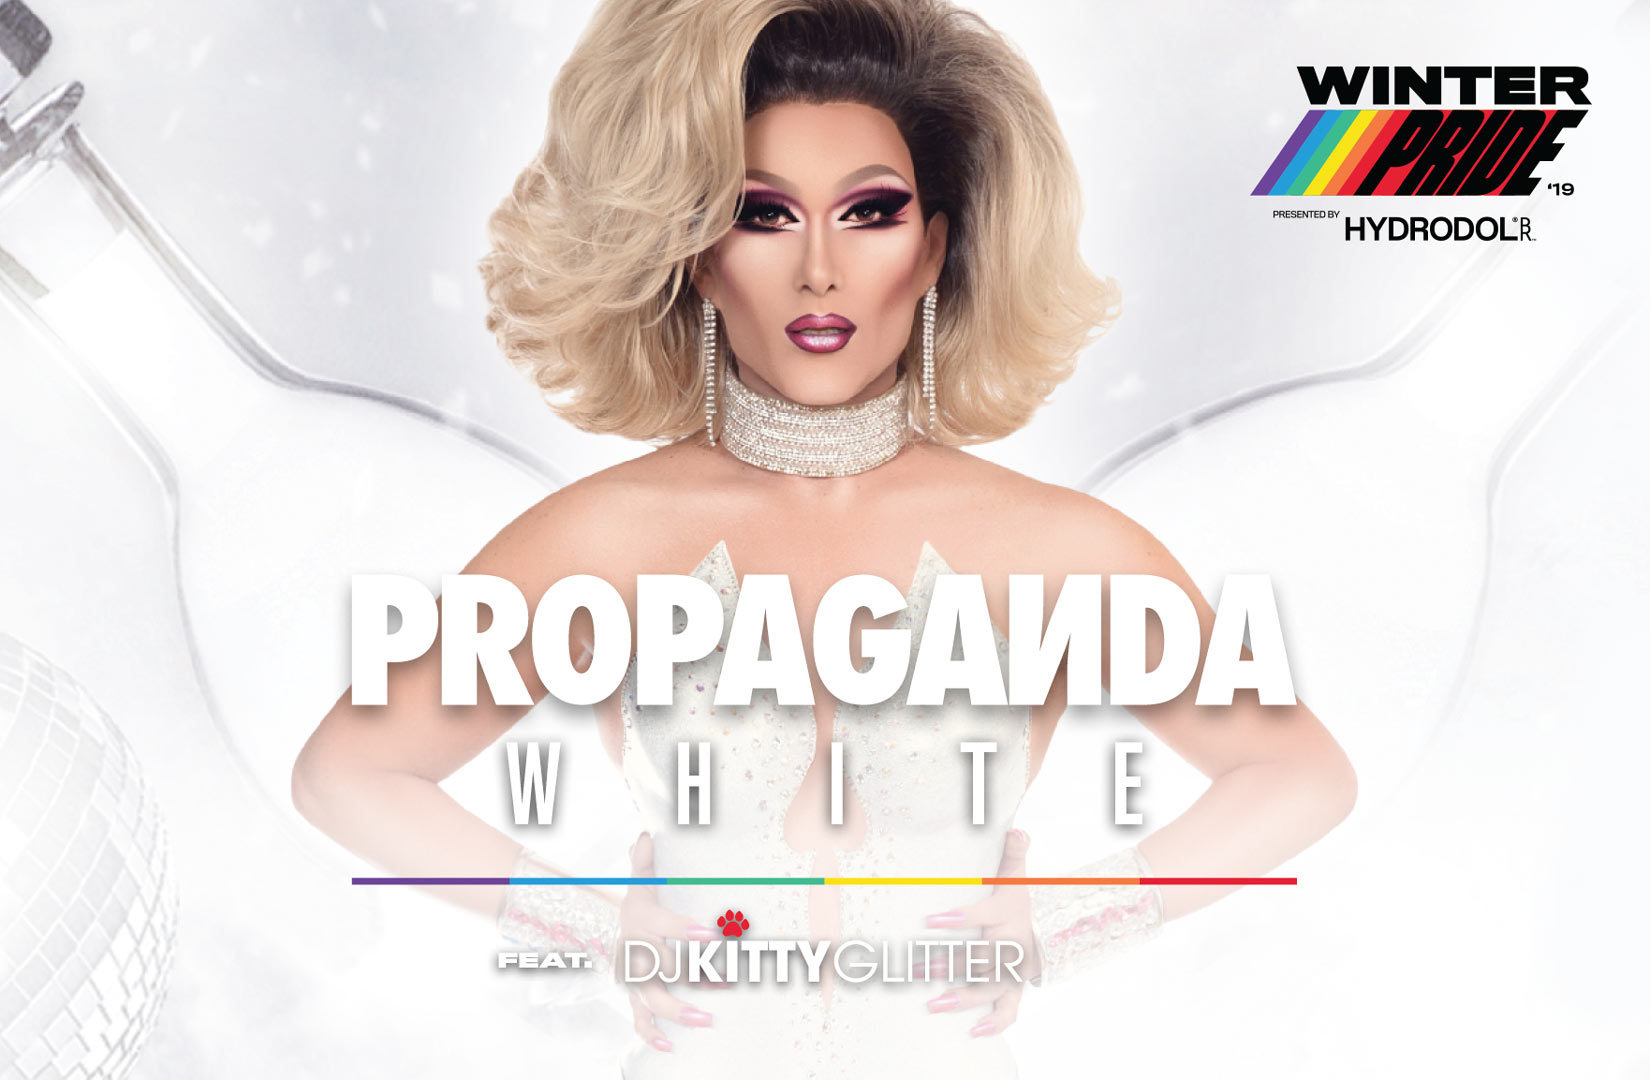 PROPAGANDA White